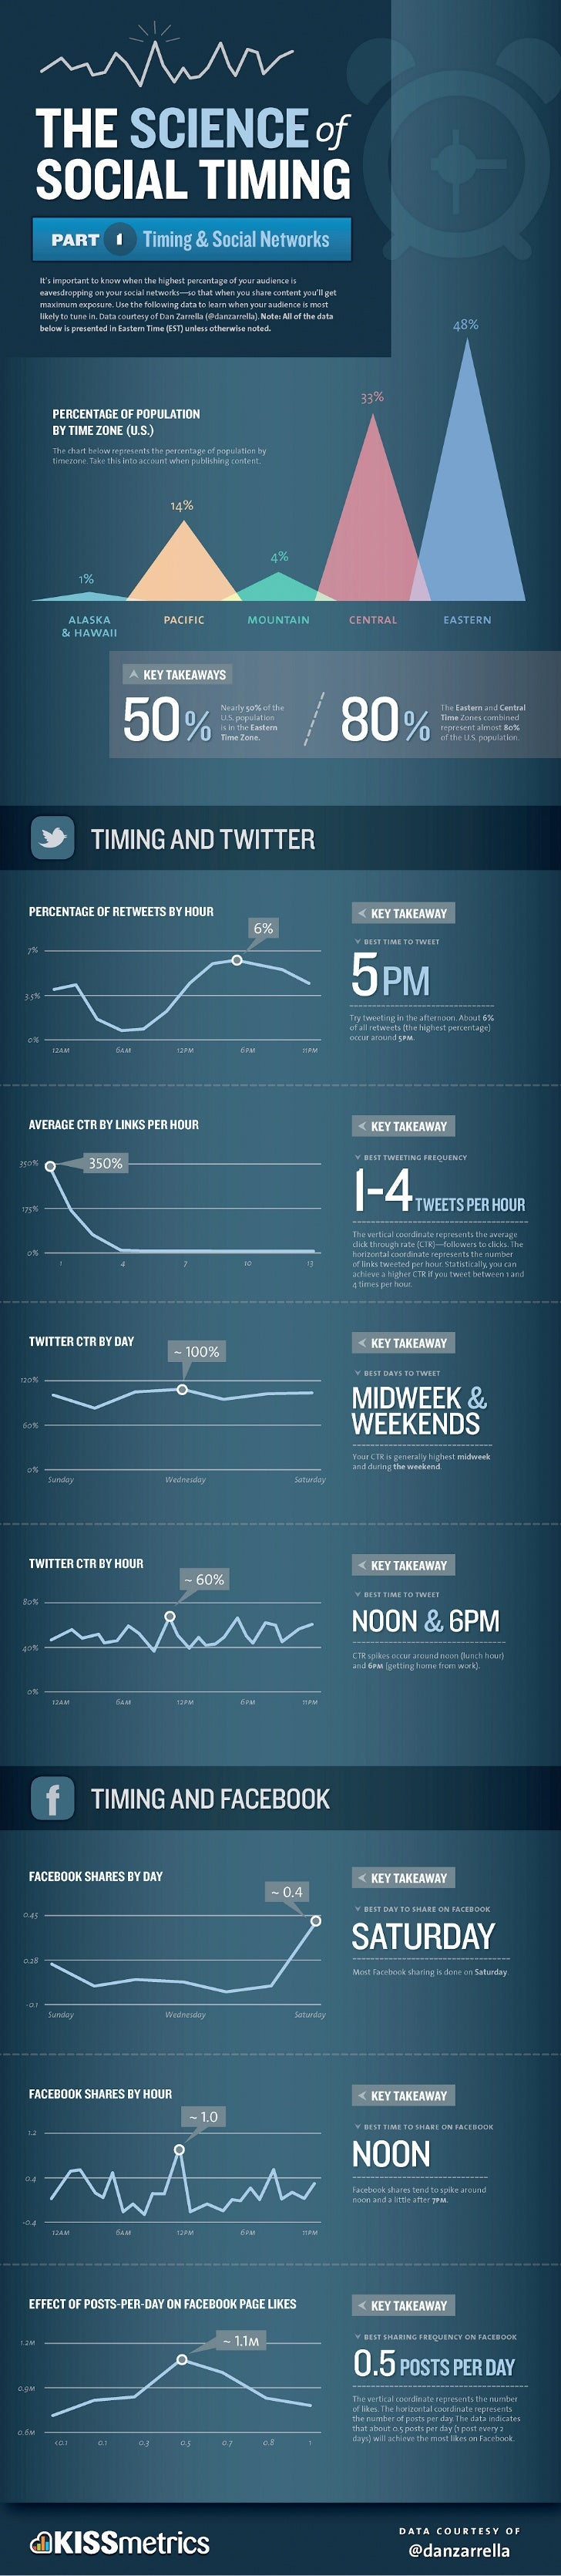 The Timing of Social Media